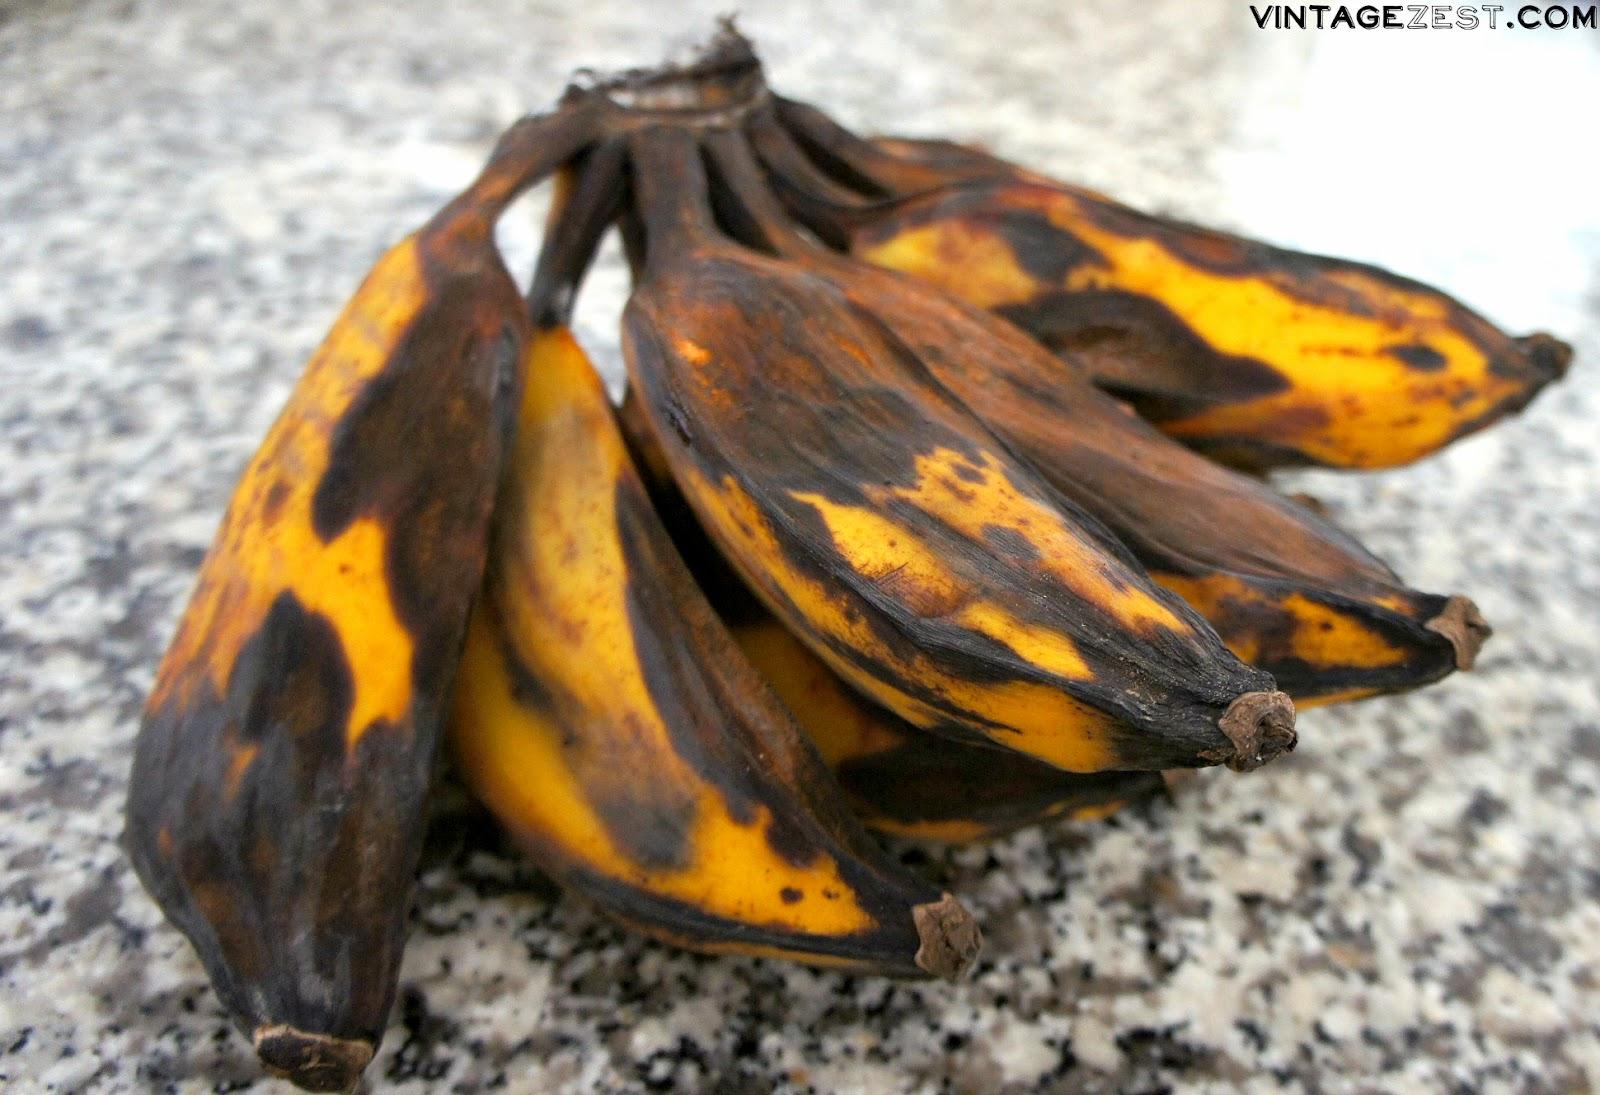 Bananacue recipe (Sweet Asian Plantain Skewers) on Diane's Vintage Zest!  #recipe #dessert #sweet